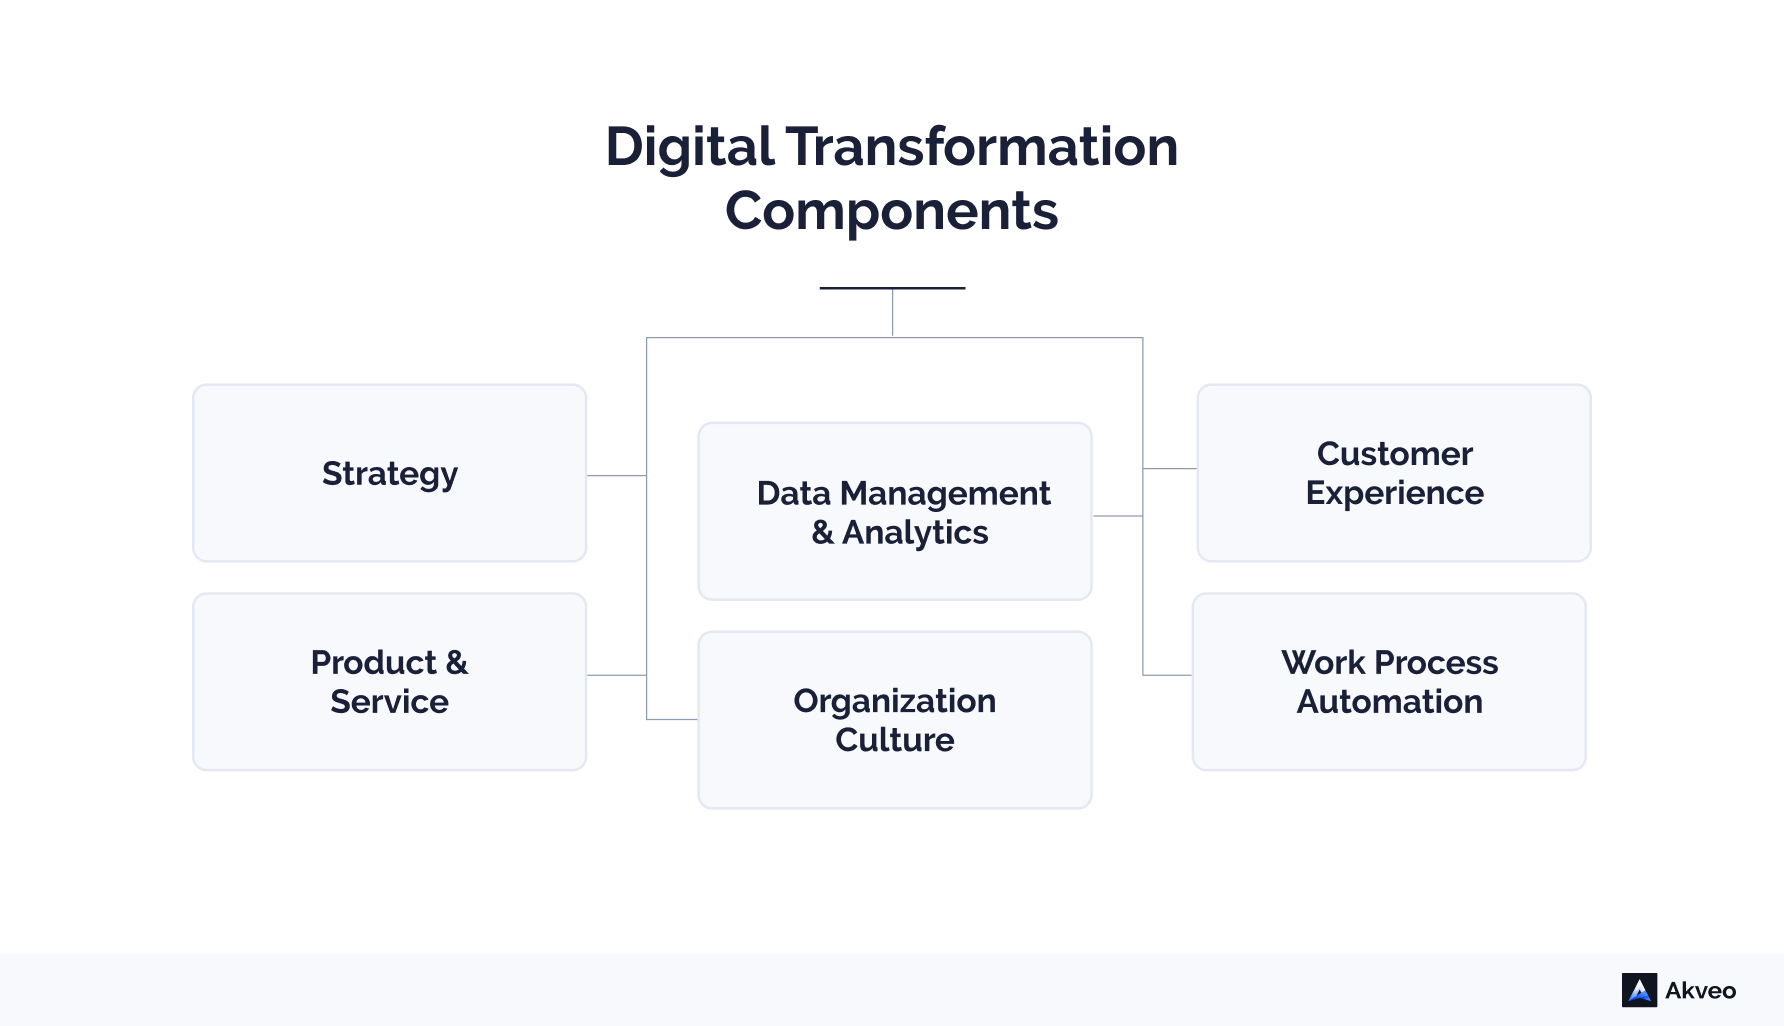 Digital Transformation Components